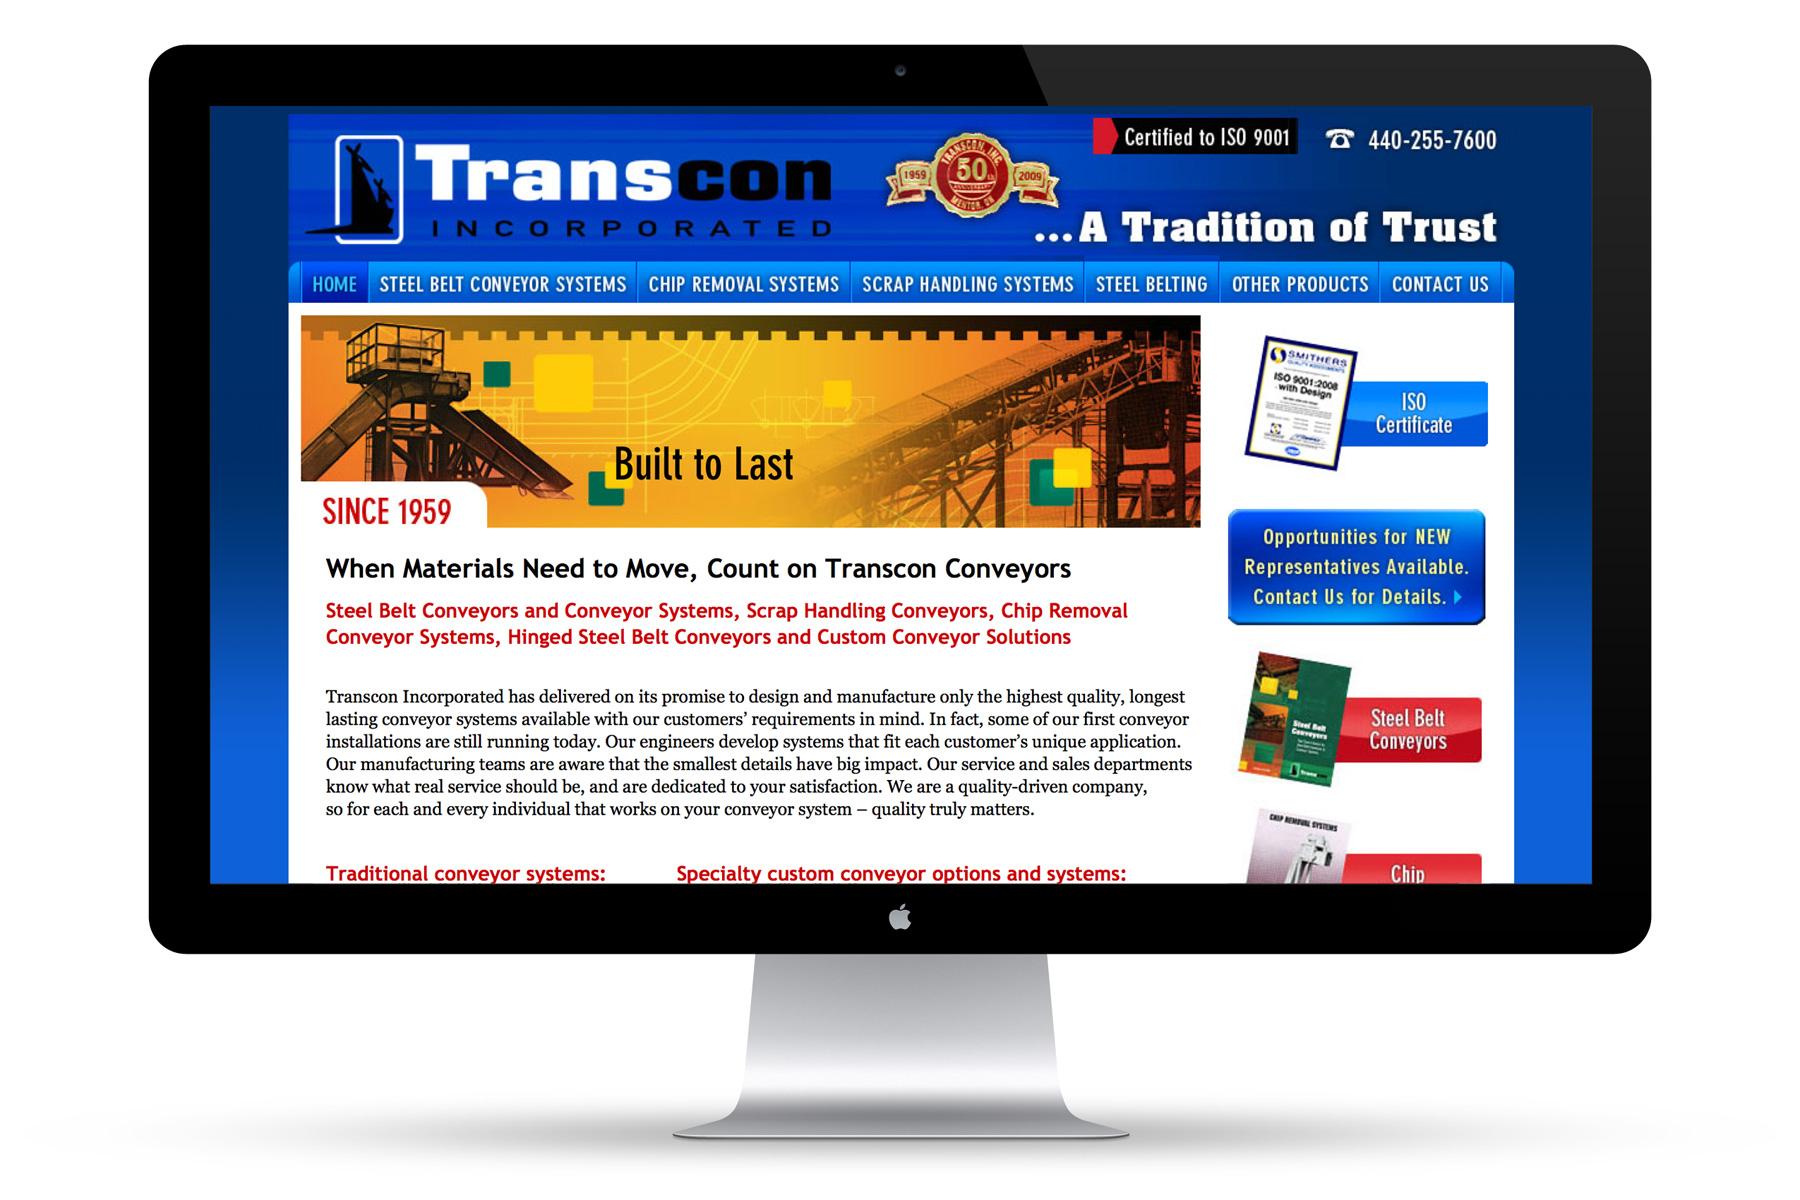 Transcon-Web_1_1800x1200